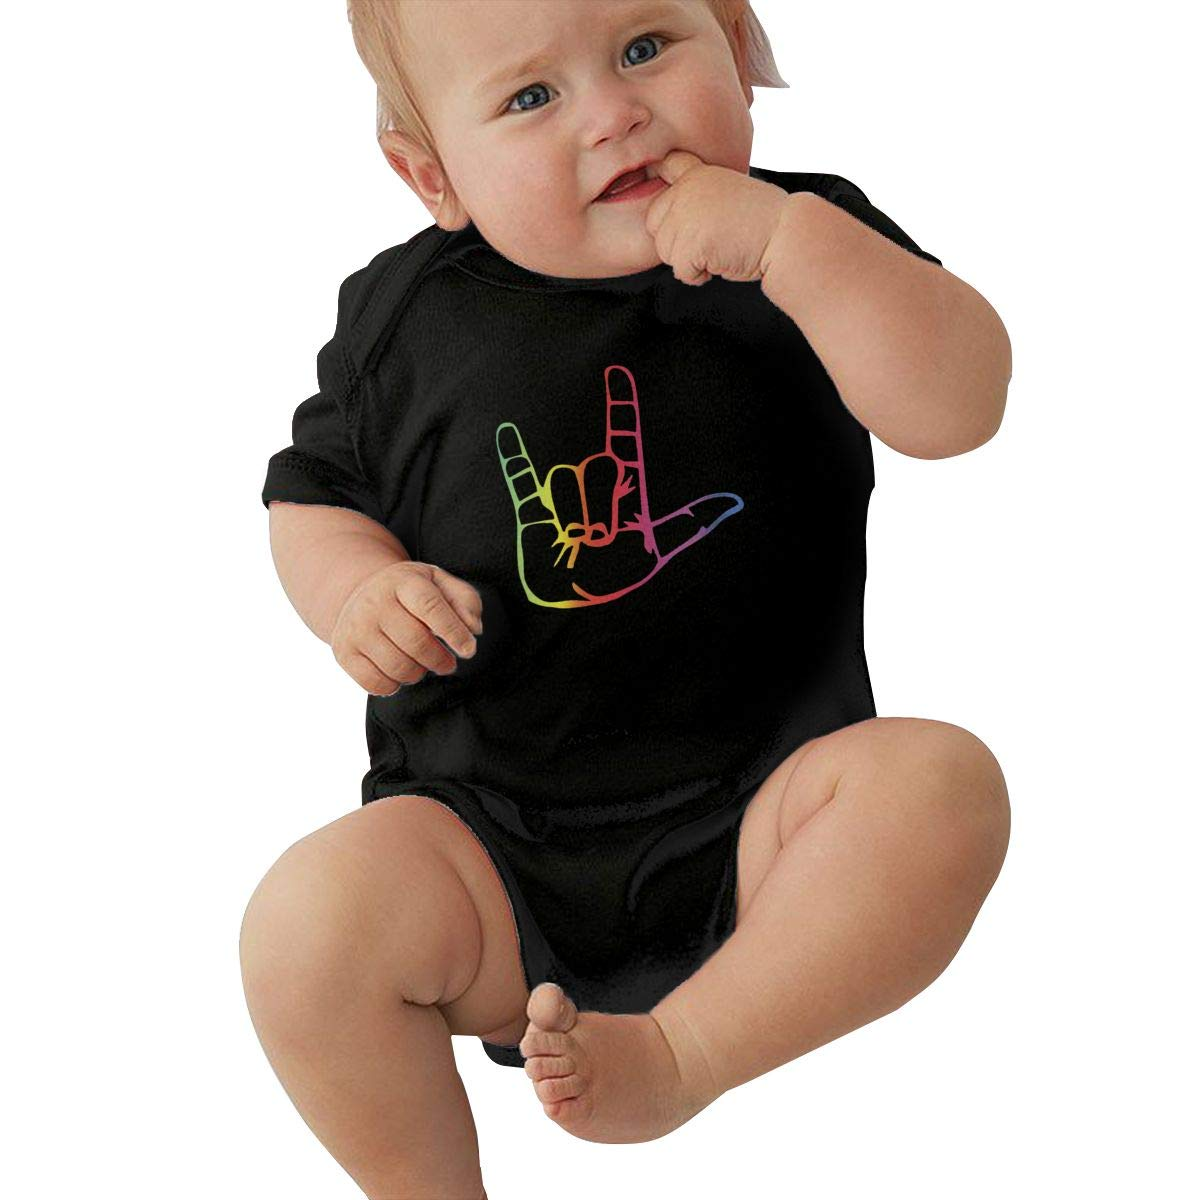 I Love You Sign Language Casual Newborn Baby Short Sleeve Bodysuit Romper Infant Summer Clothing Black